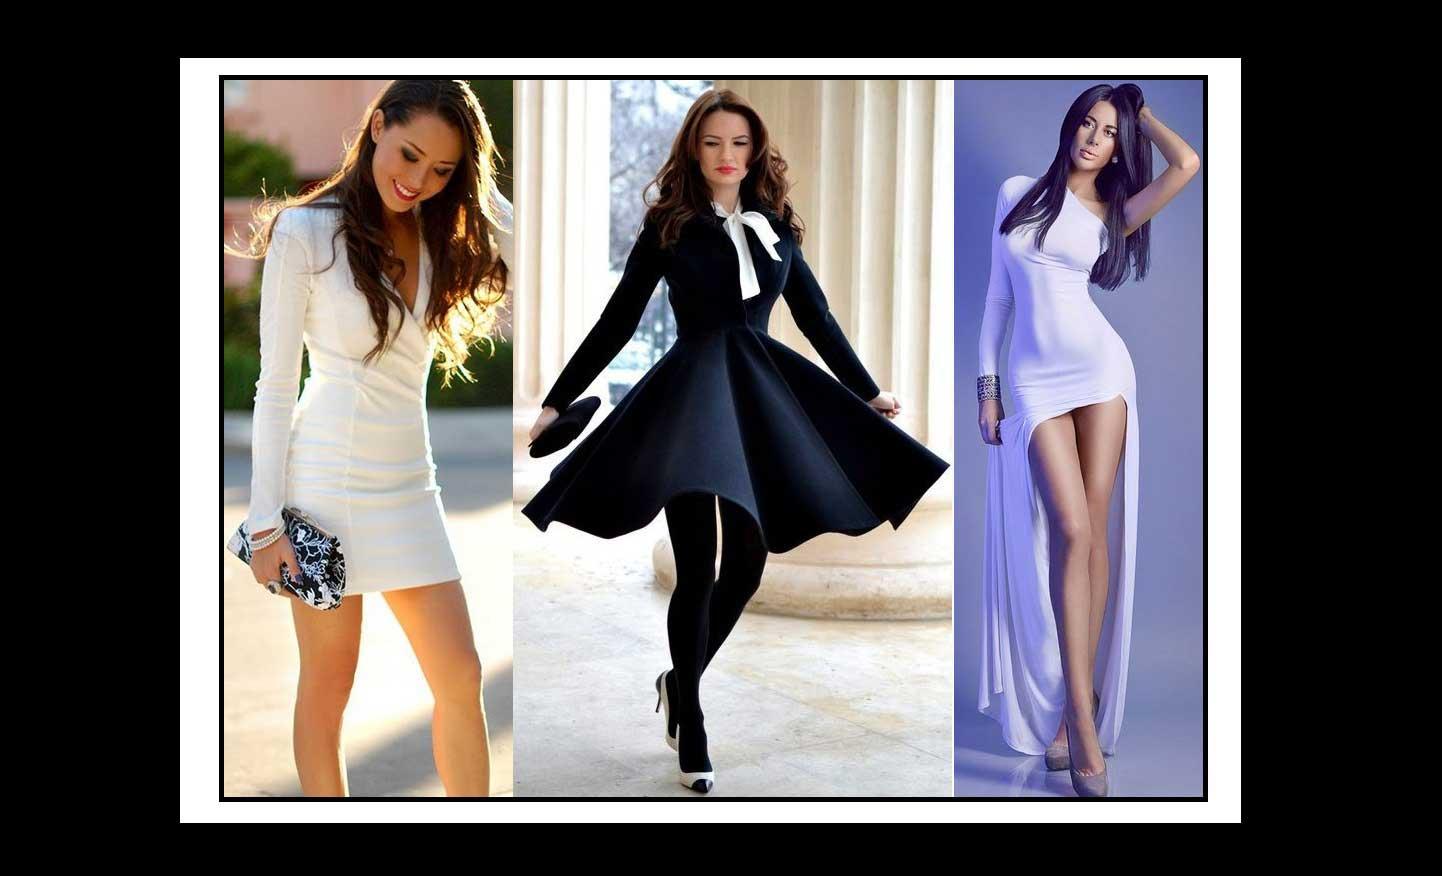 dee1dc83ce3 31 Εντυπωσιακά φορέματα για βραδινή έξοδο & γάμο! | ediva.gr